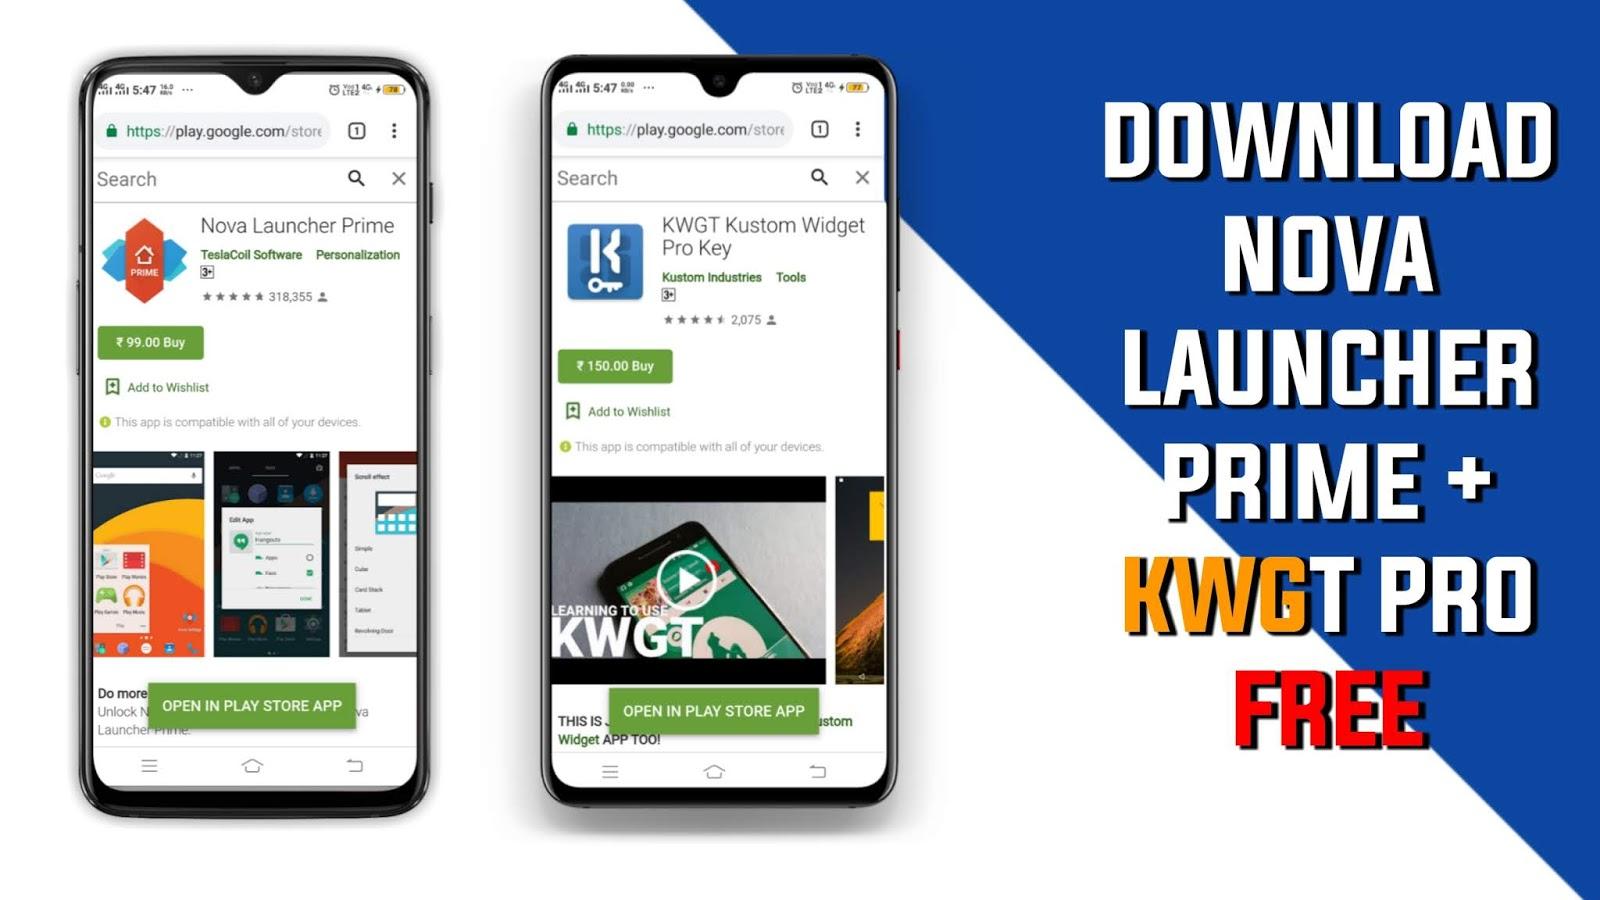 Download Nova Launcher Prime Apk Free Download Kwgt Kustom Widget Pro Key Apk Free